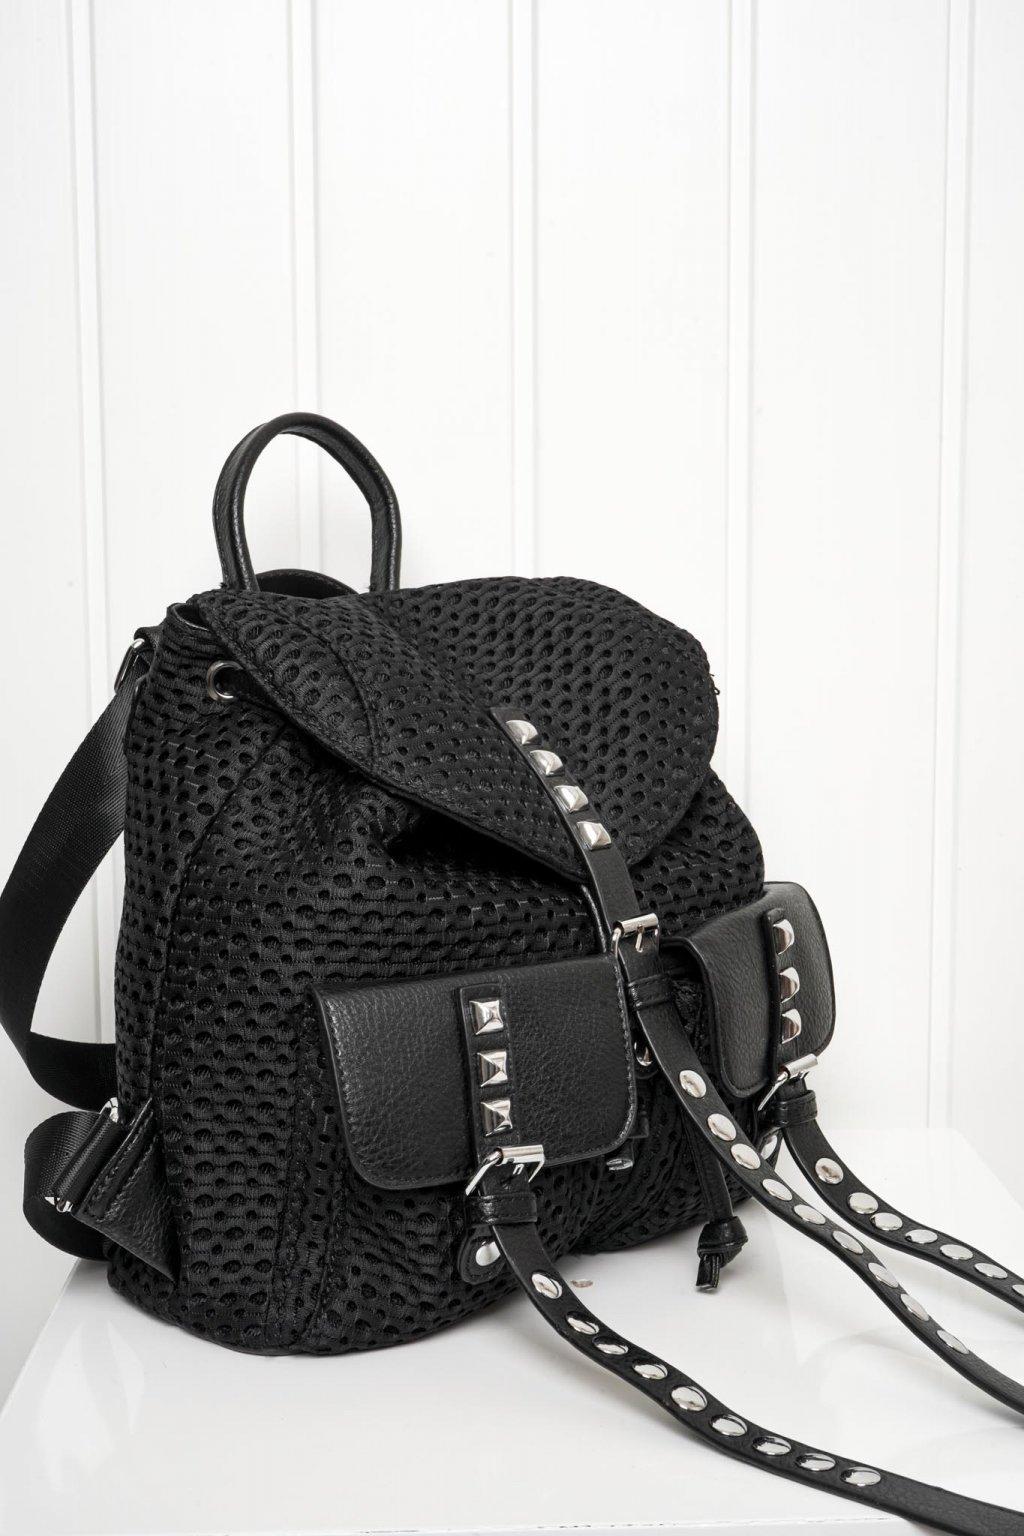 Kabelka, crossbody, ruksak, shopping bag, shopperka, 476